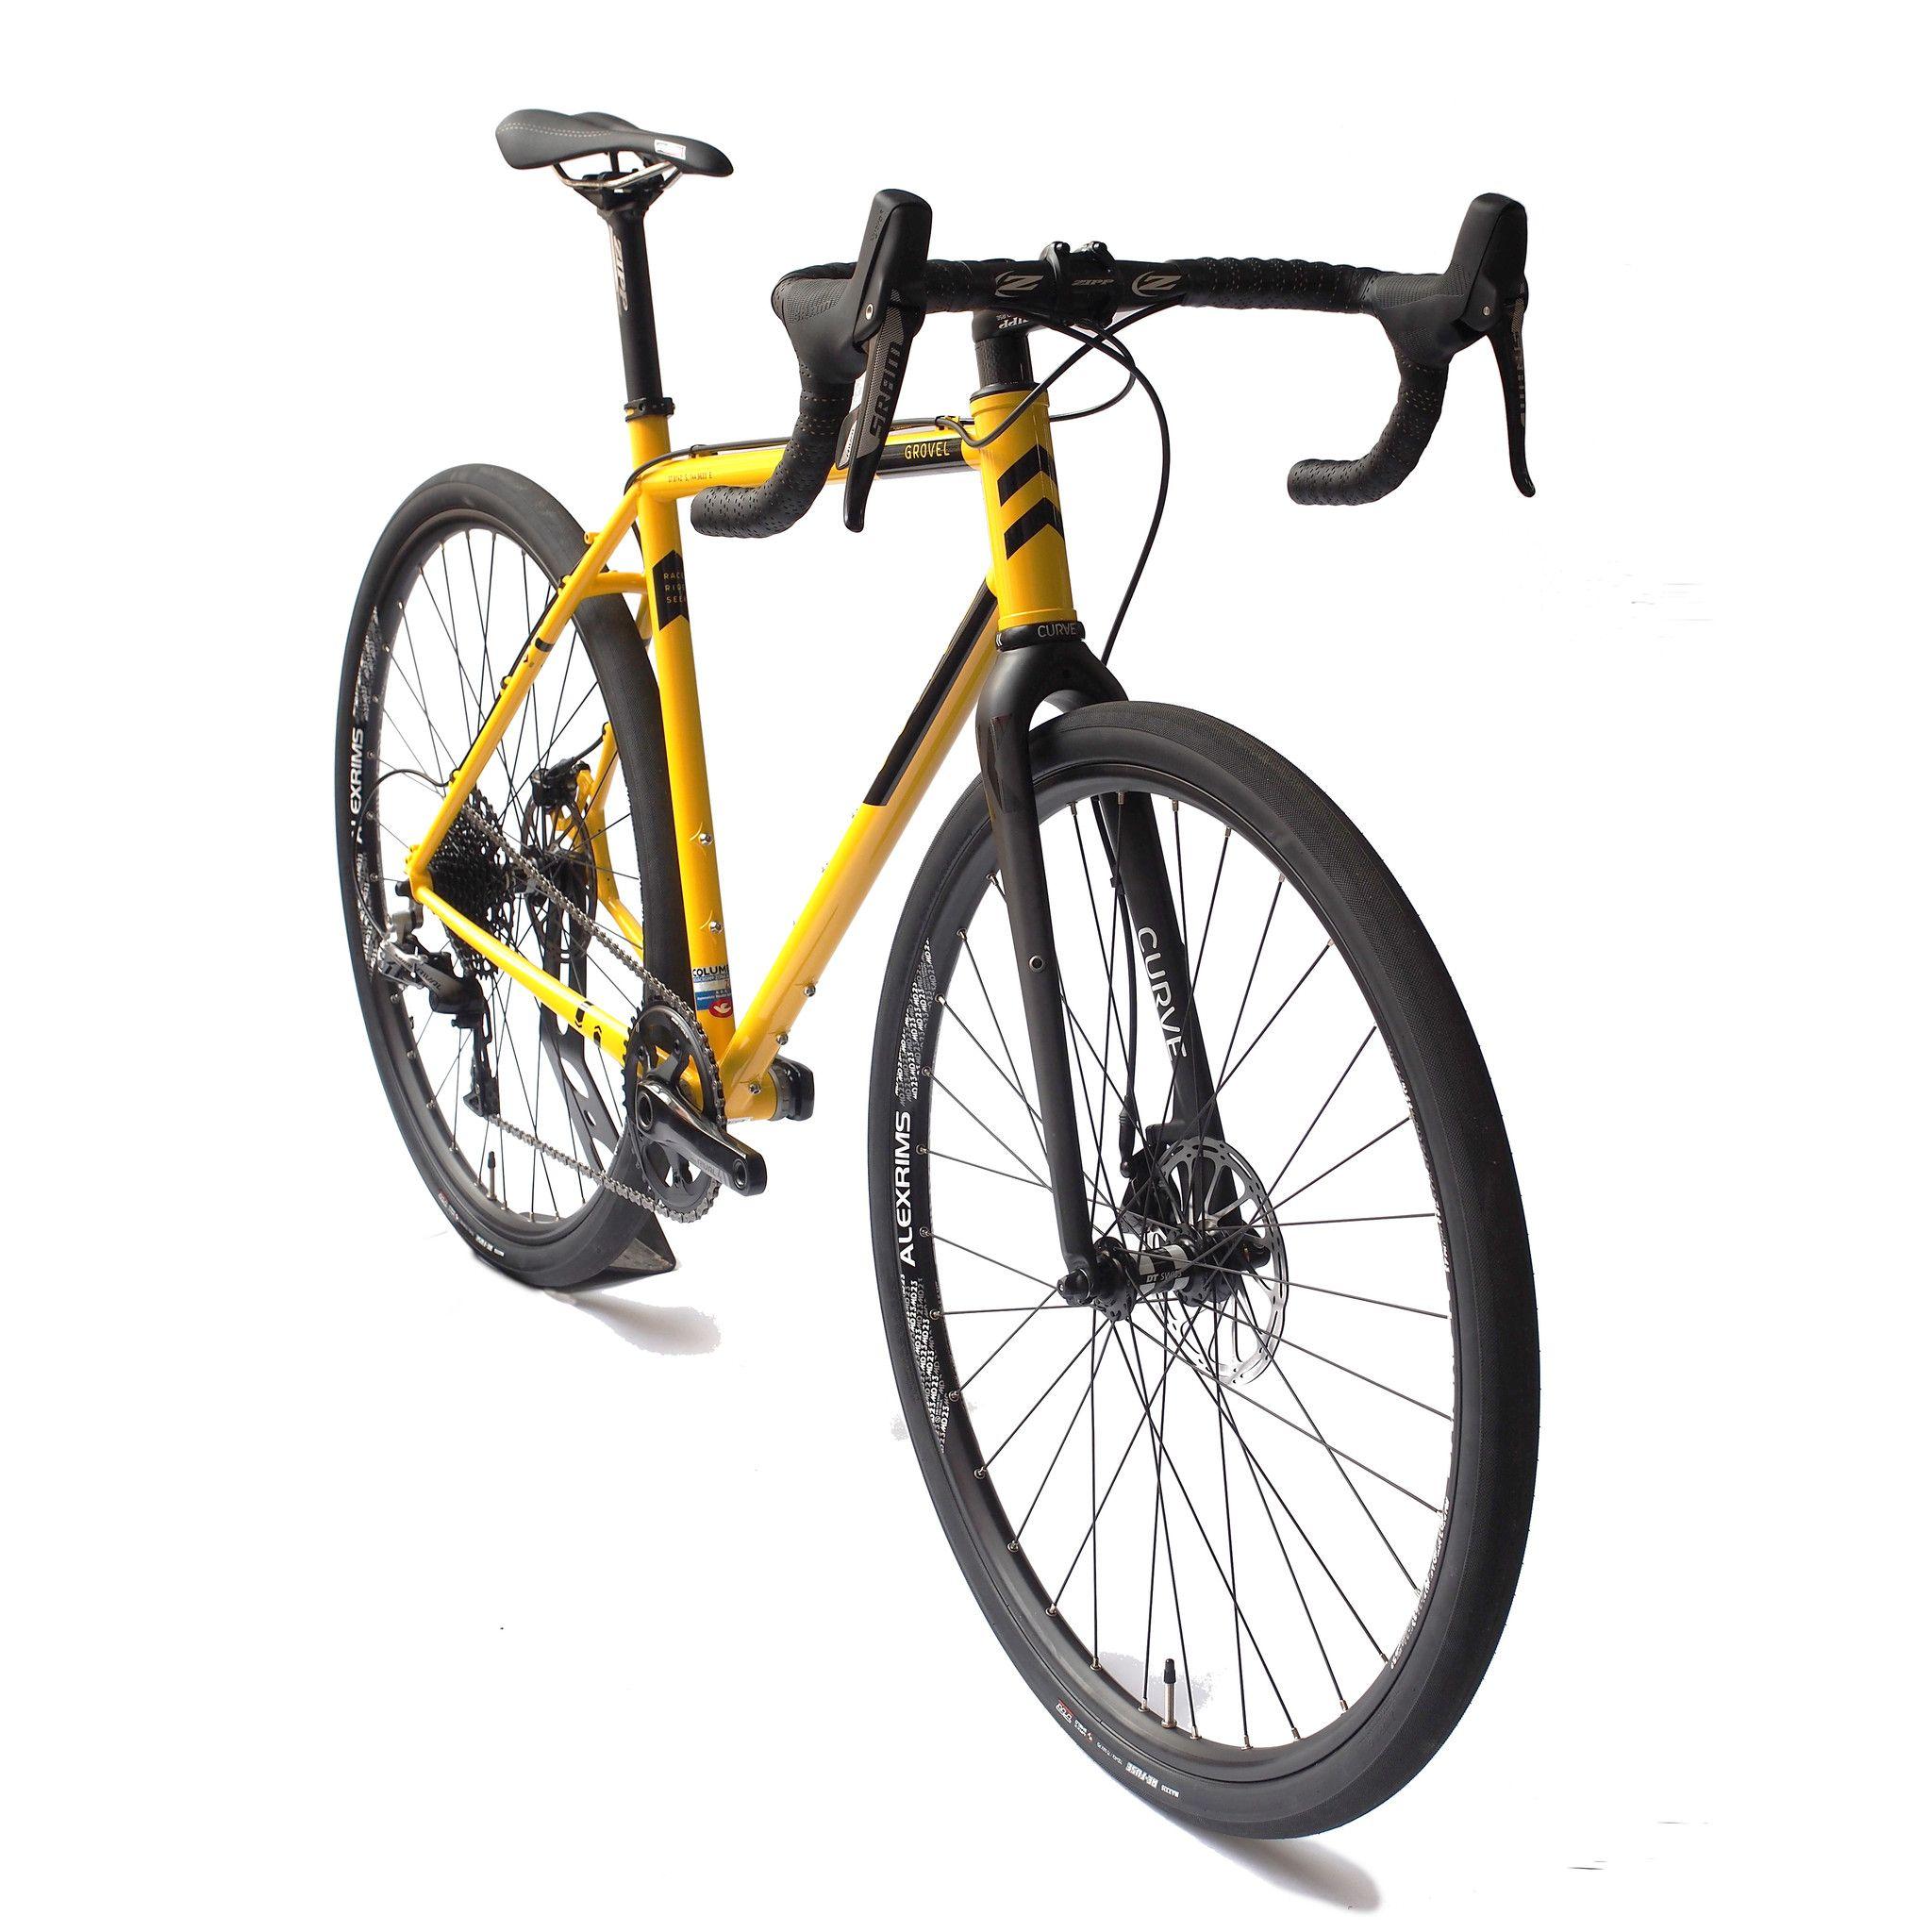 Curve Grovel V2 - Steel Cross/Touring Bike - Curve Cycling | Cycling ...